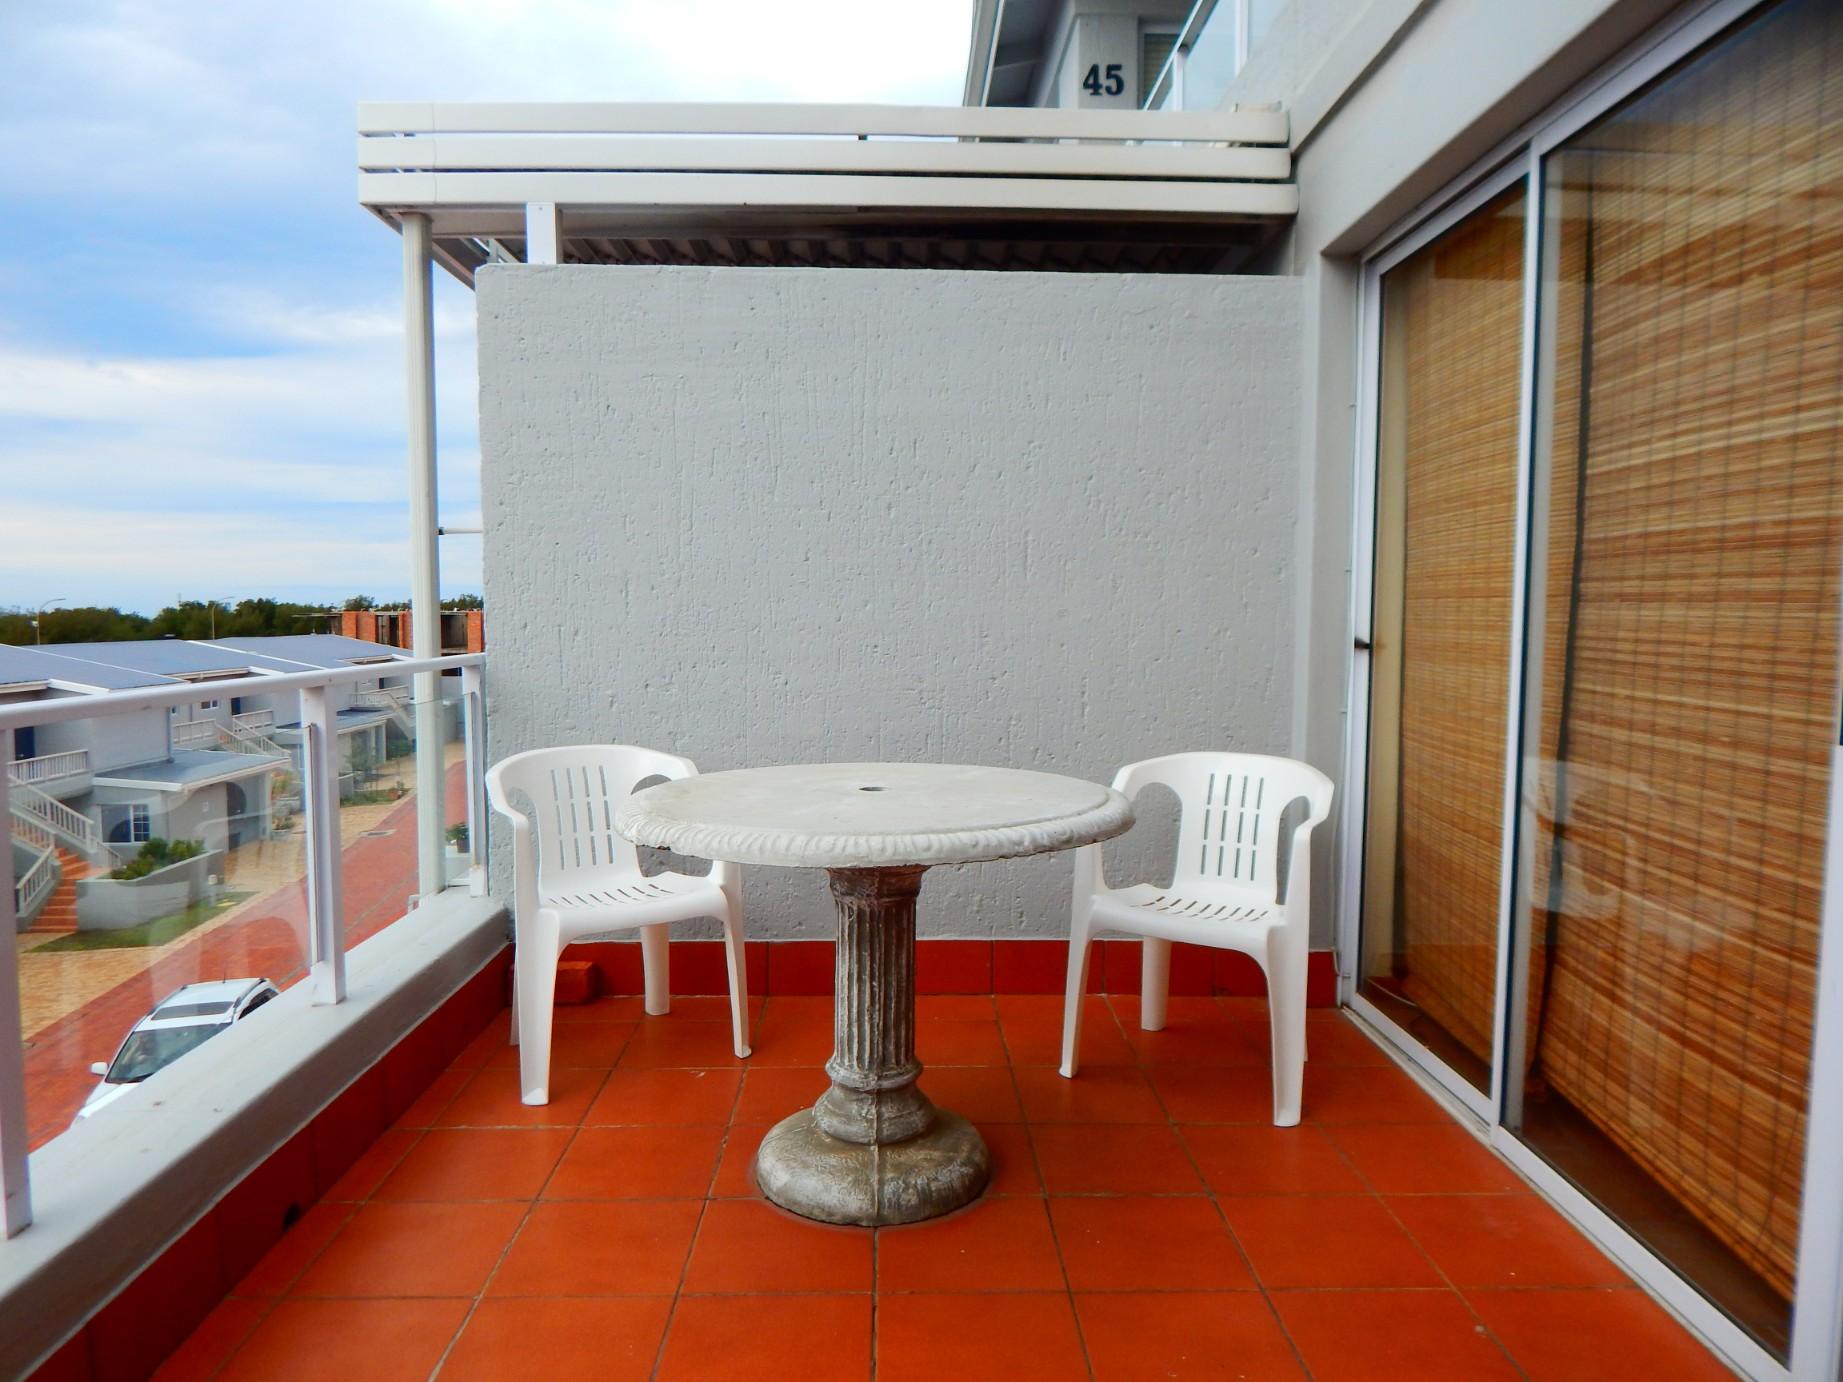 3 Bedroom Apartment for sale in De Bakke ENT0066483 : photo#22